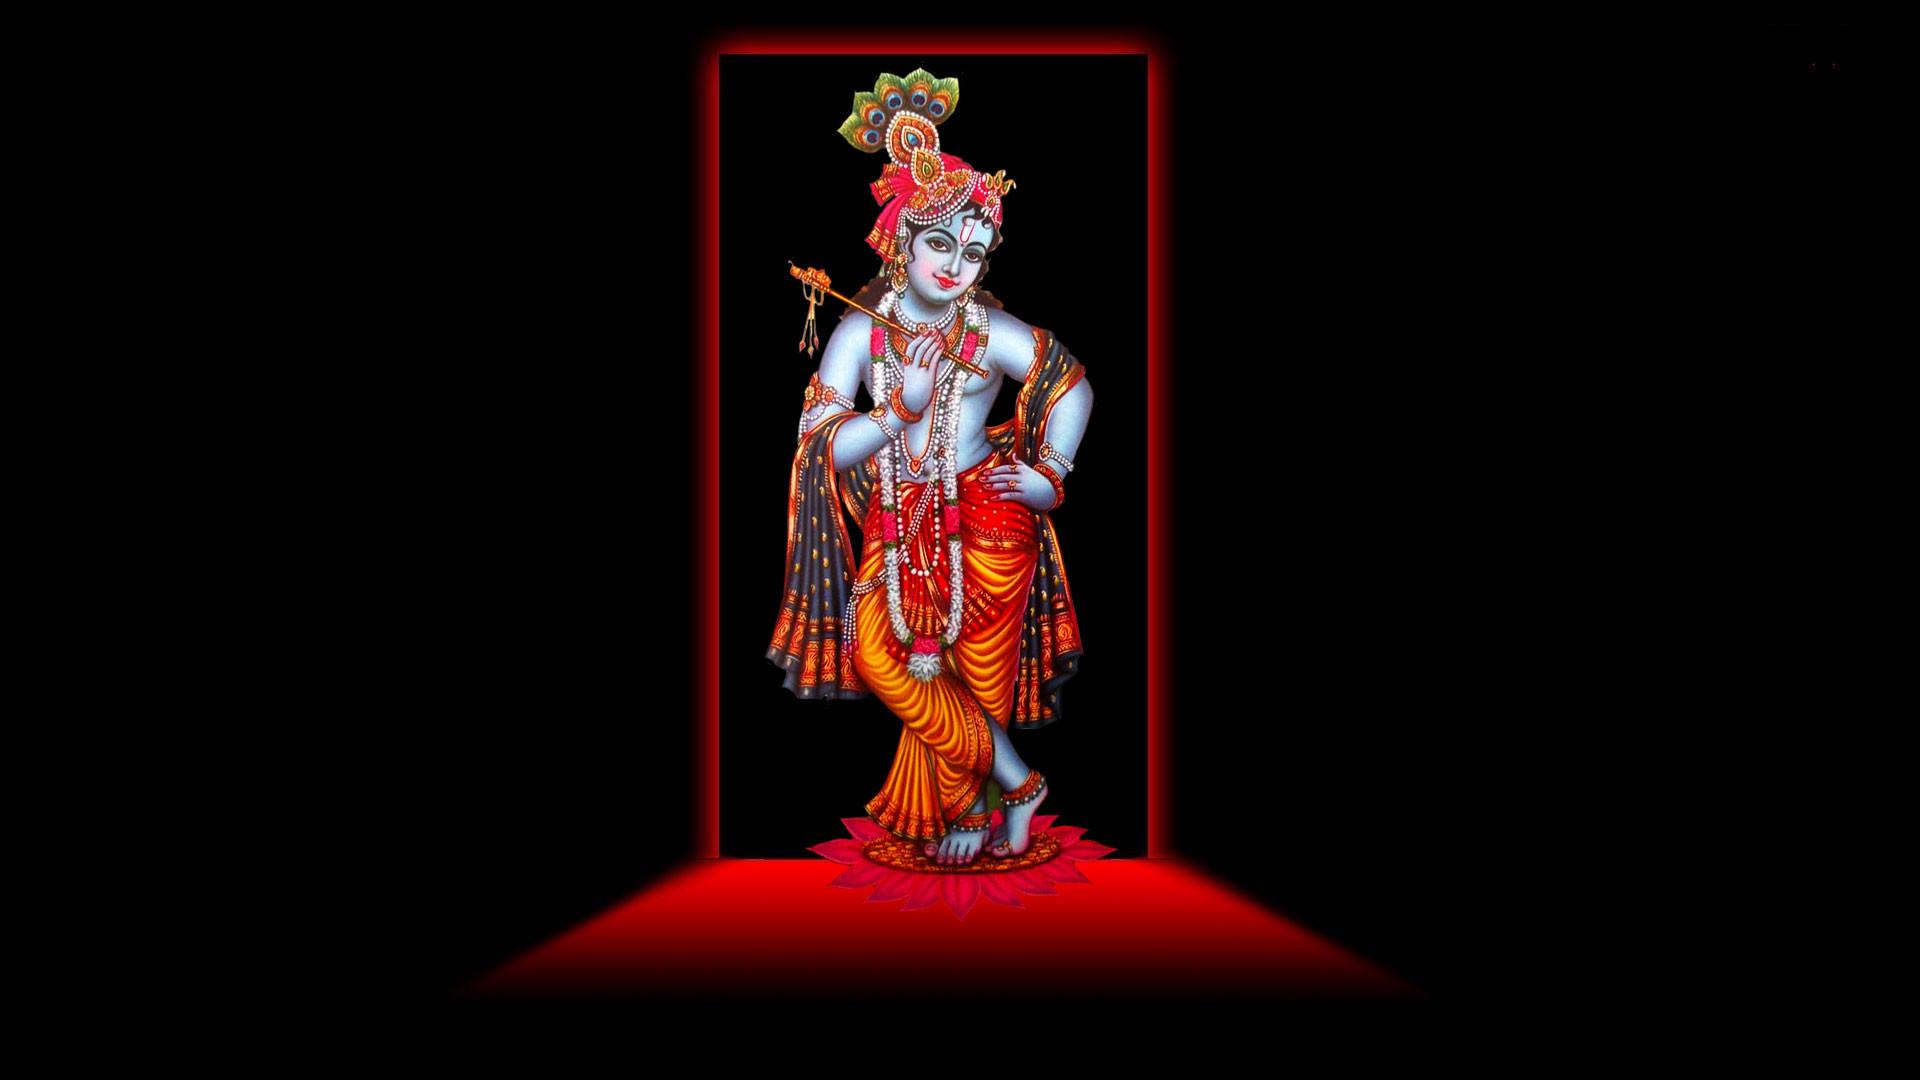 hd pics photos gods black and red lord krishna desktop background wallpaper